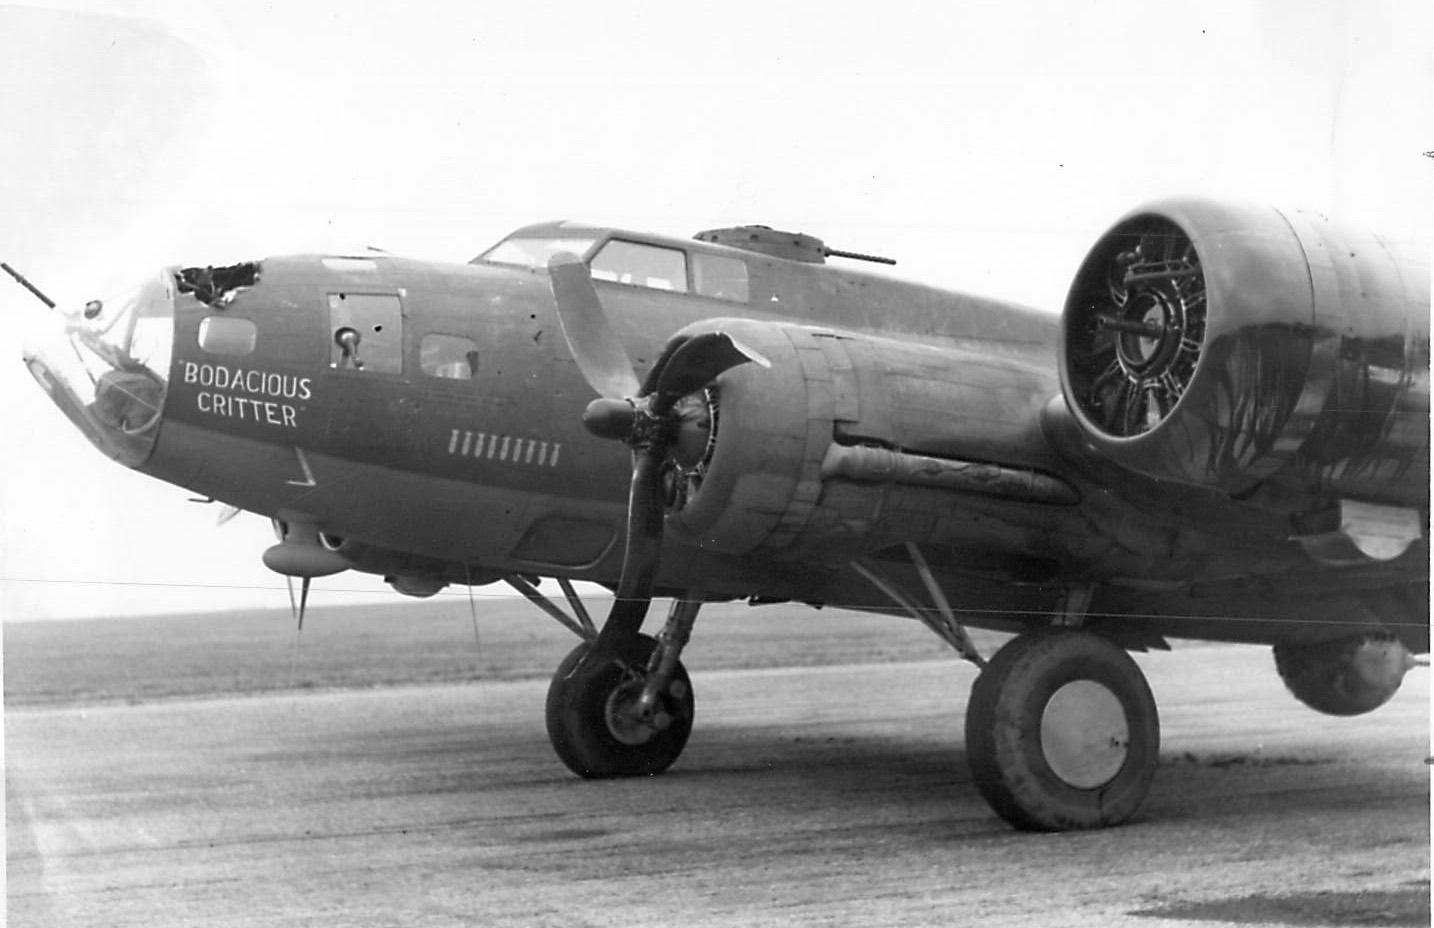 B-17 #42-5251 / Pride of Karians aka Bodacious Critter